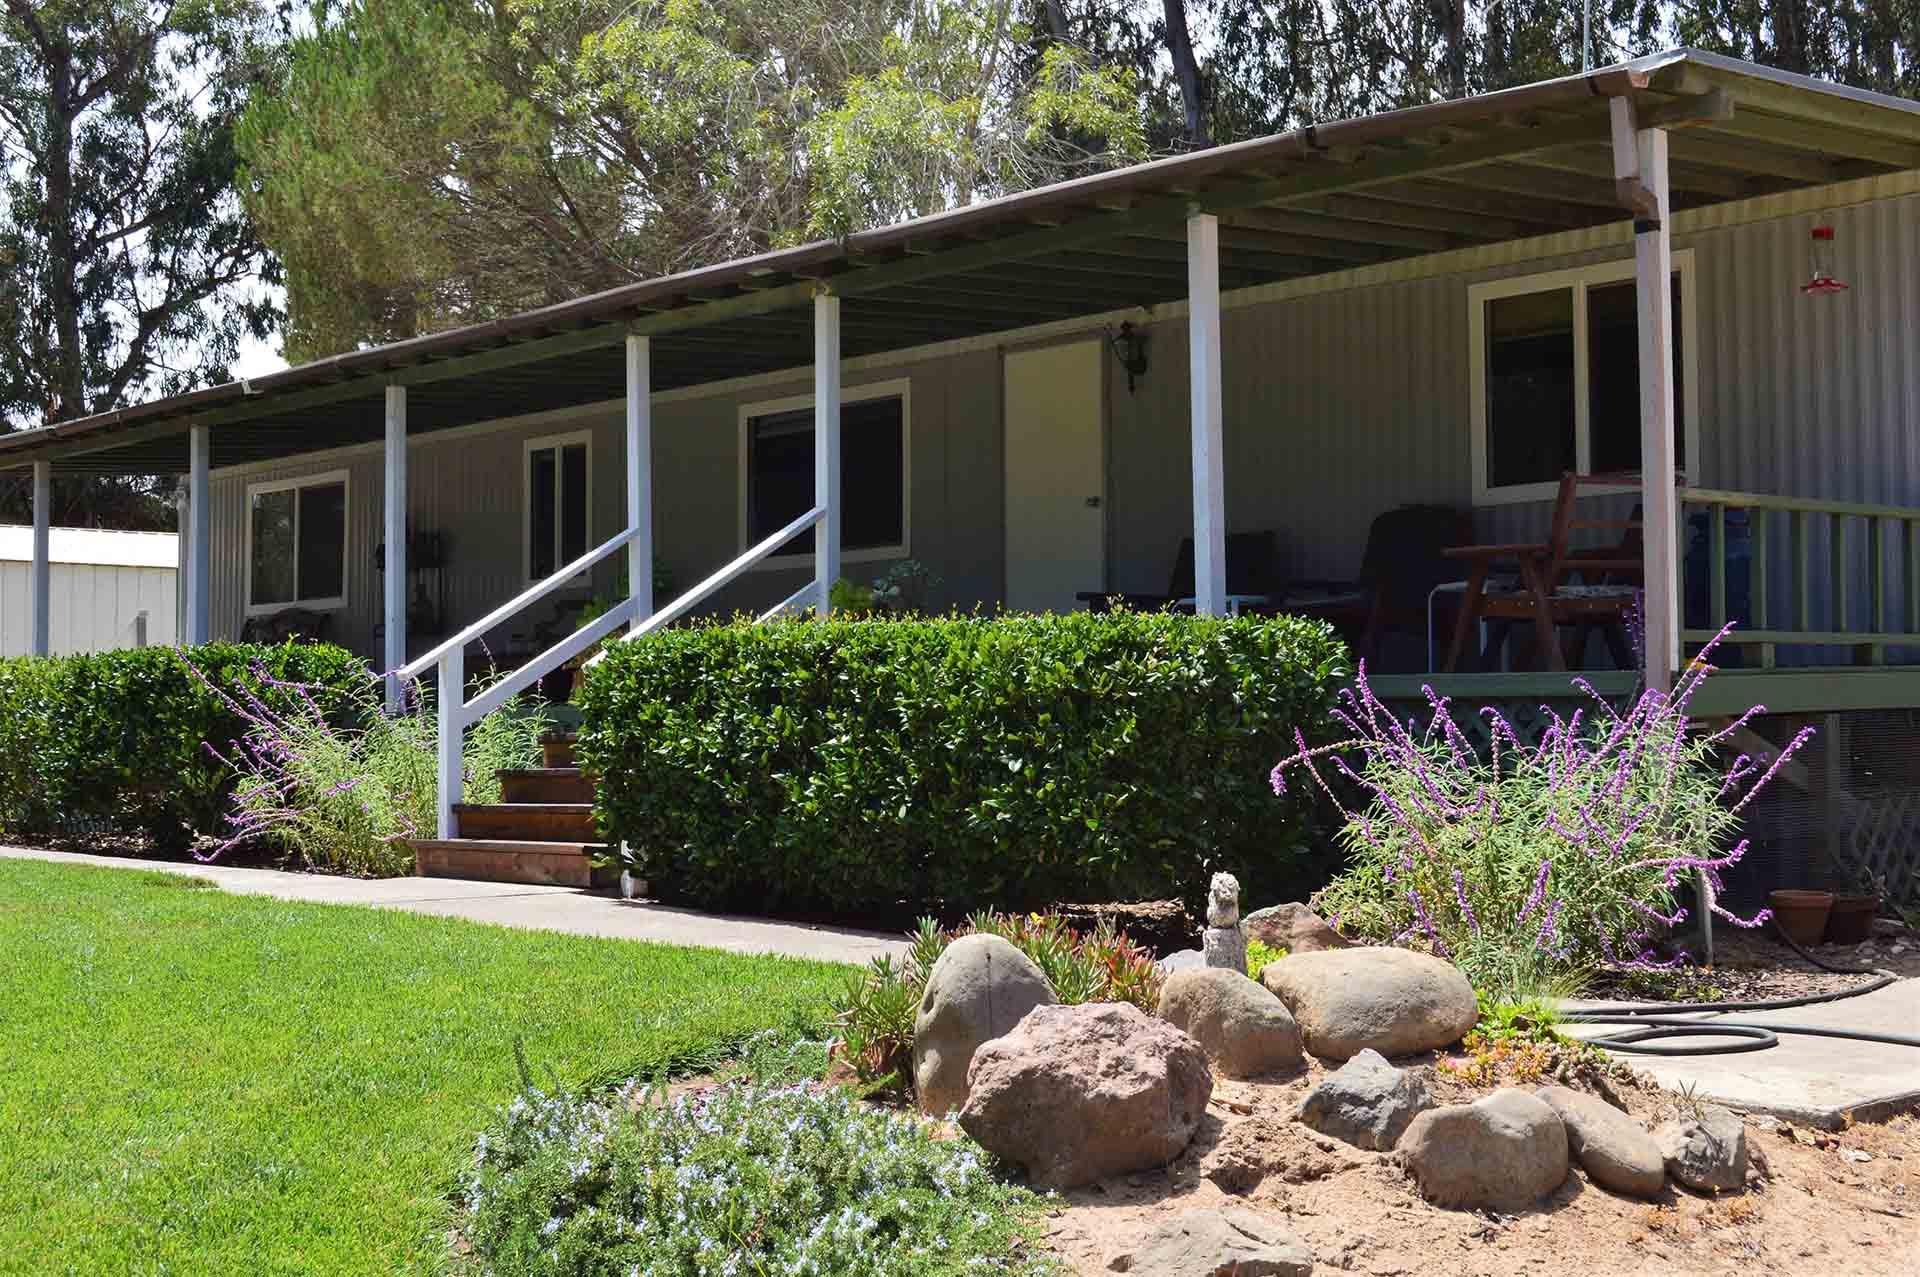 Homeowners Insurance in San Luis Obispo, Arroyo Grande, Nipomo